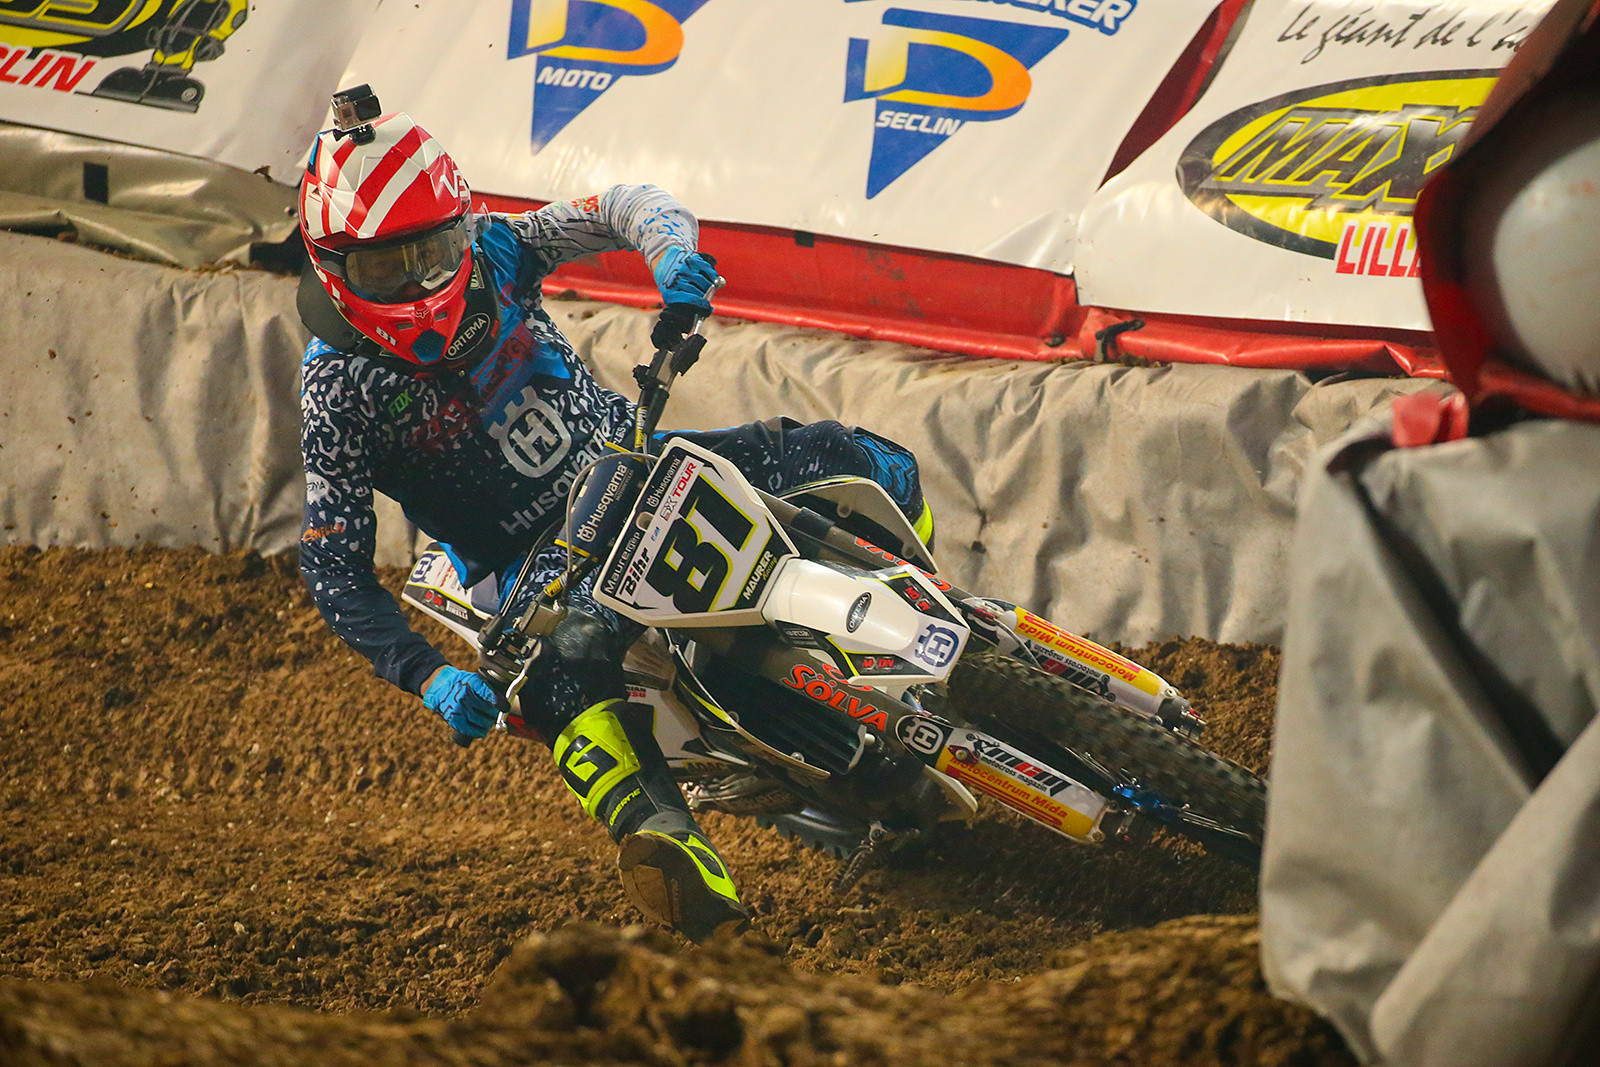 Brian Hsu - Photo Gallery: Paris-Lille Supercross, Day 2 - Motocross Pictures - Vital MX